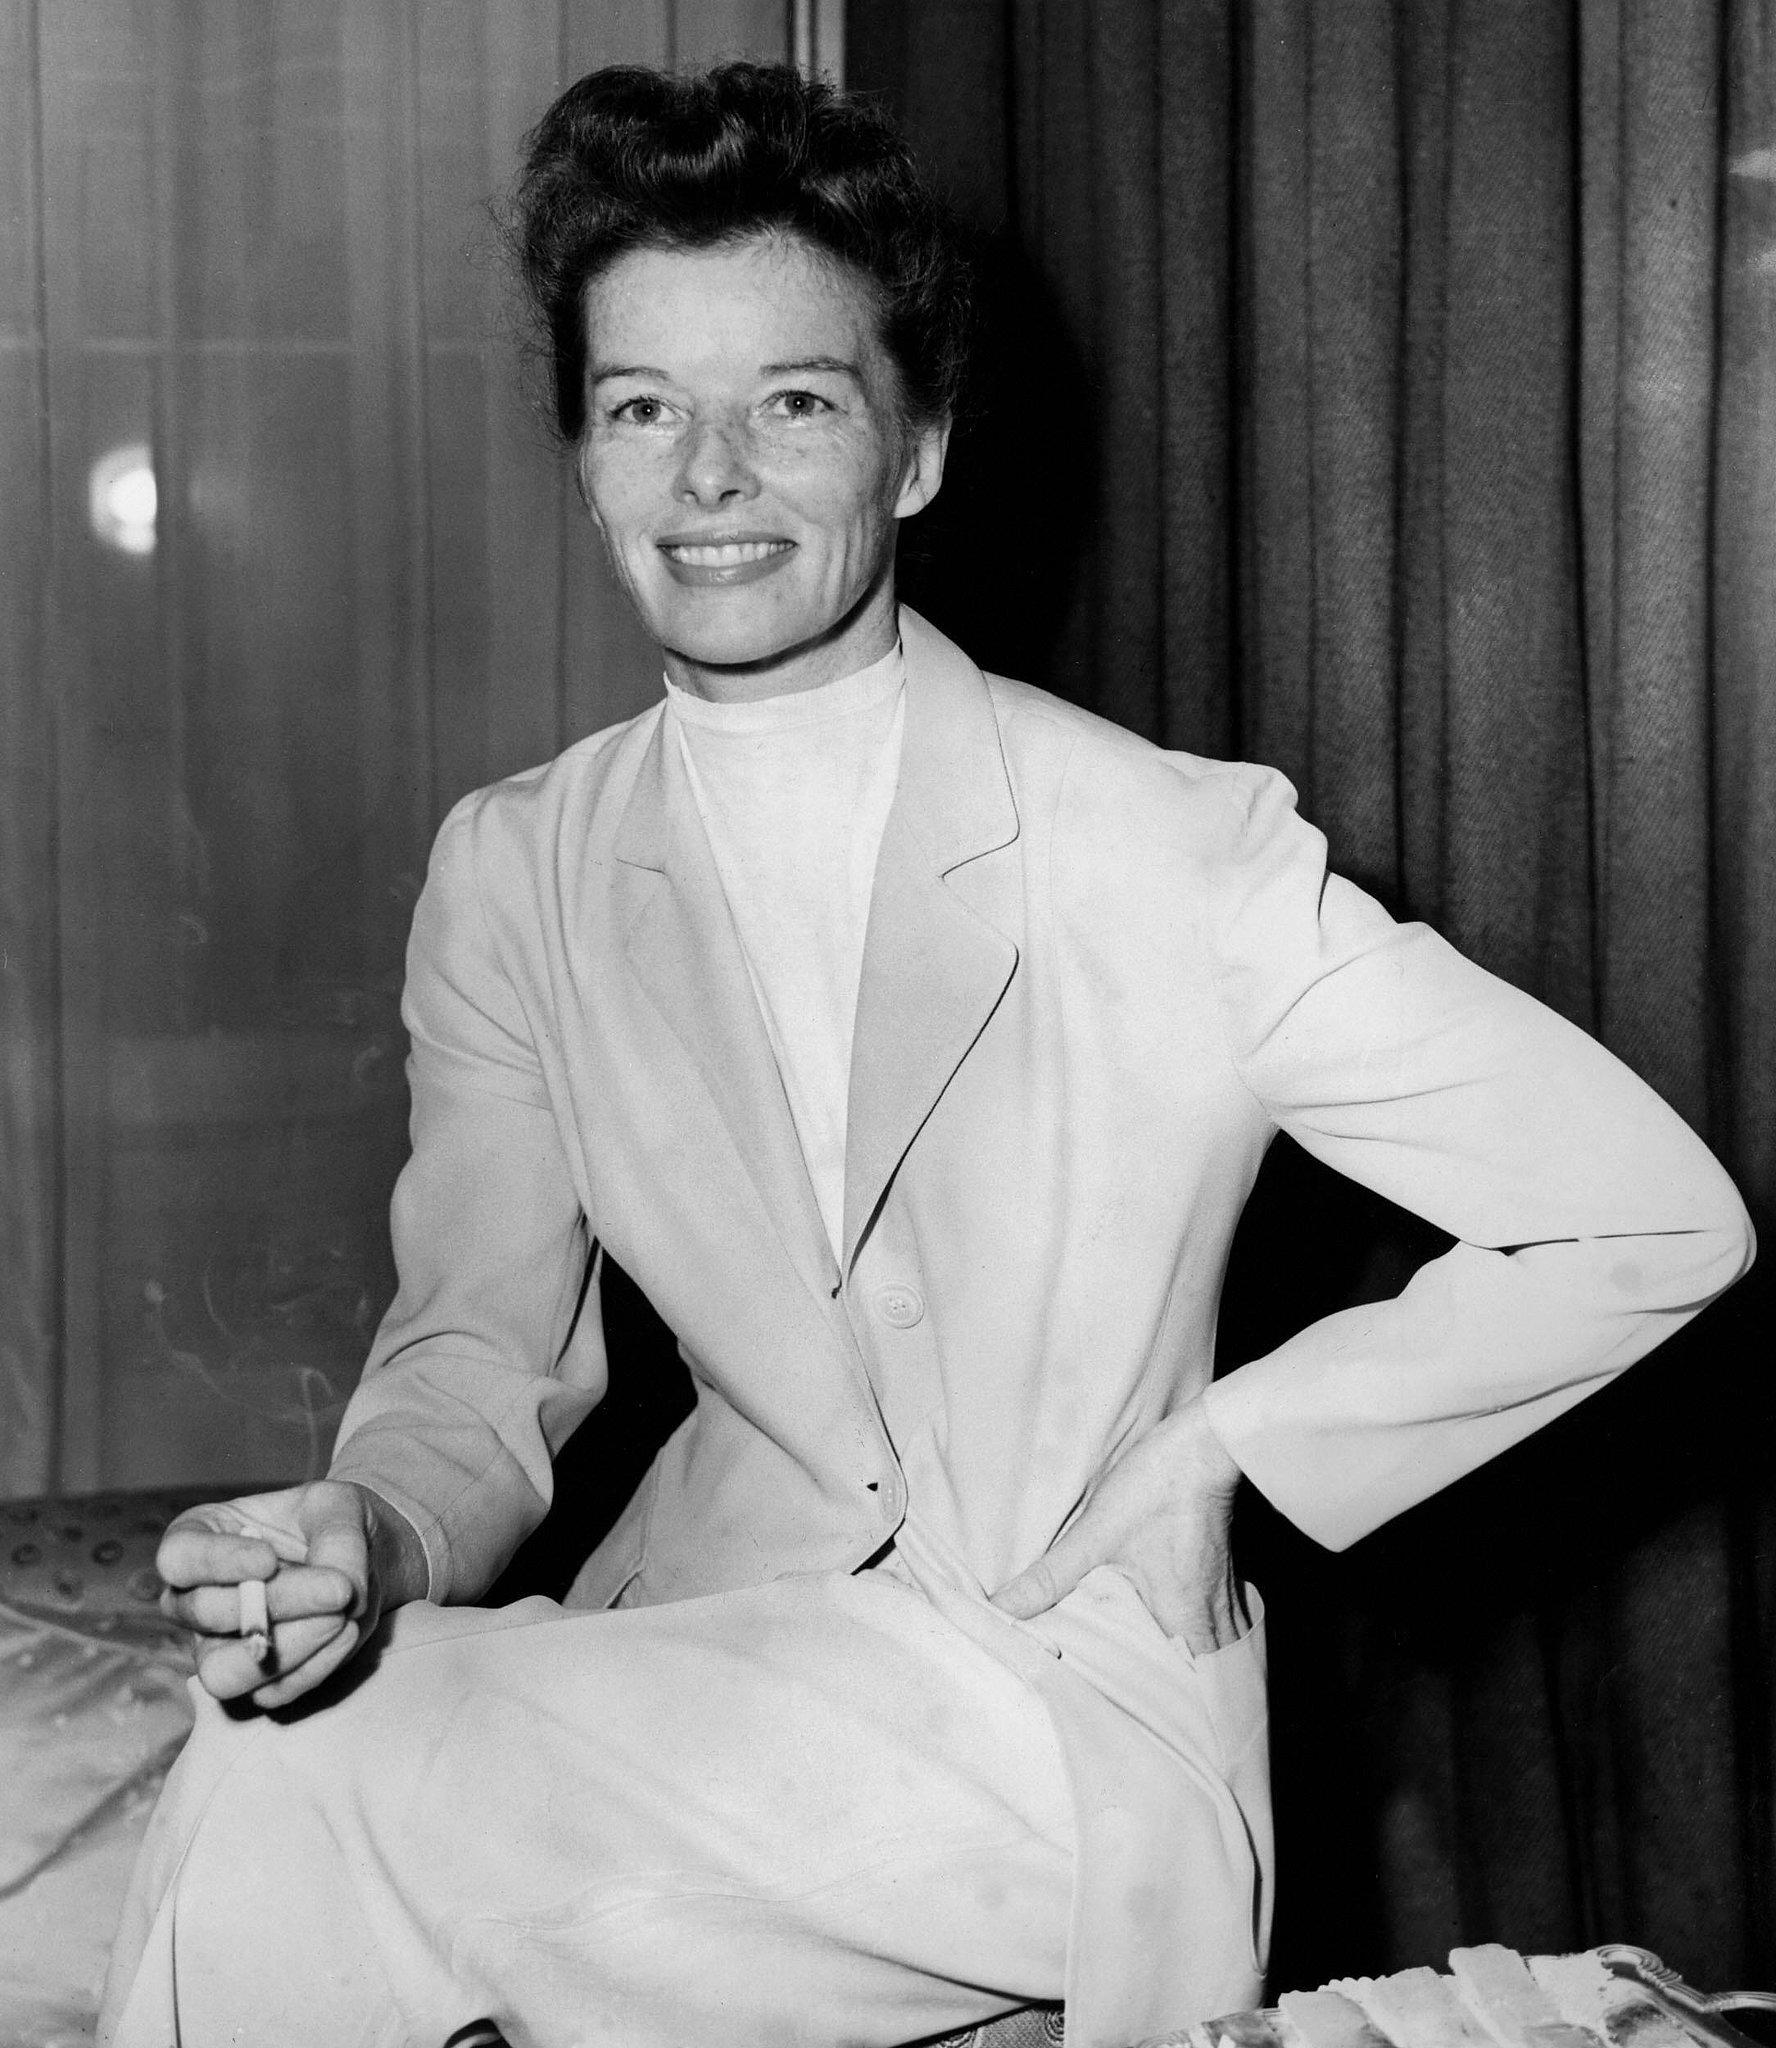 Katharine Hepburn at a London Reception in 1951